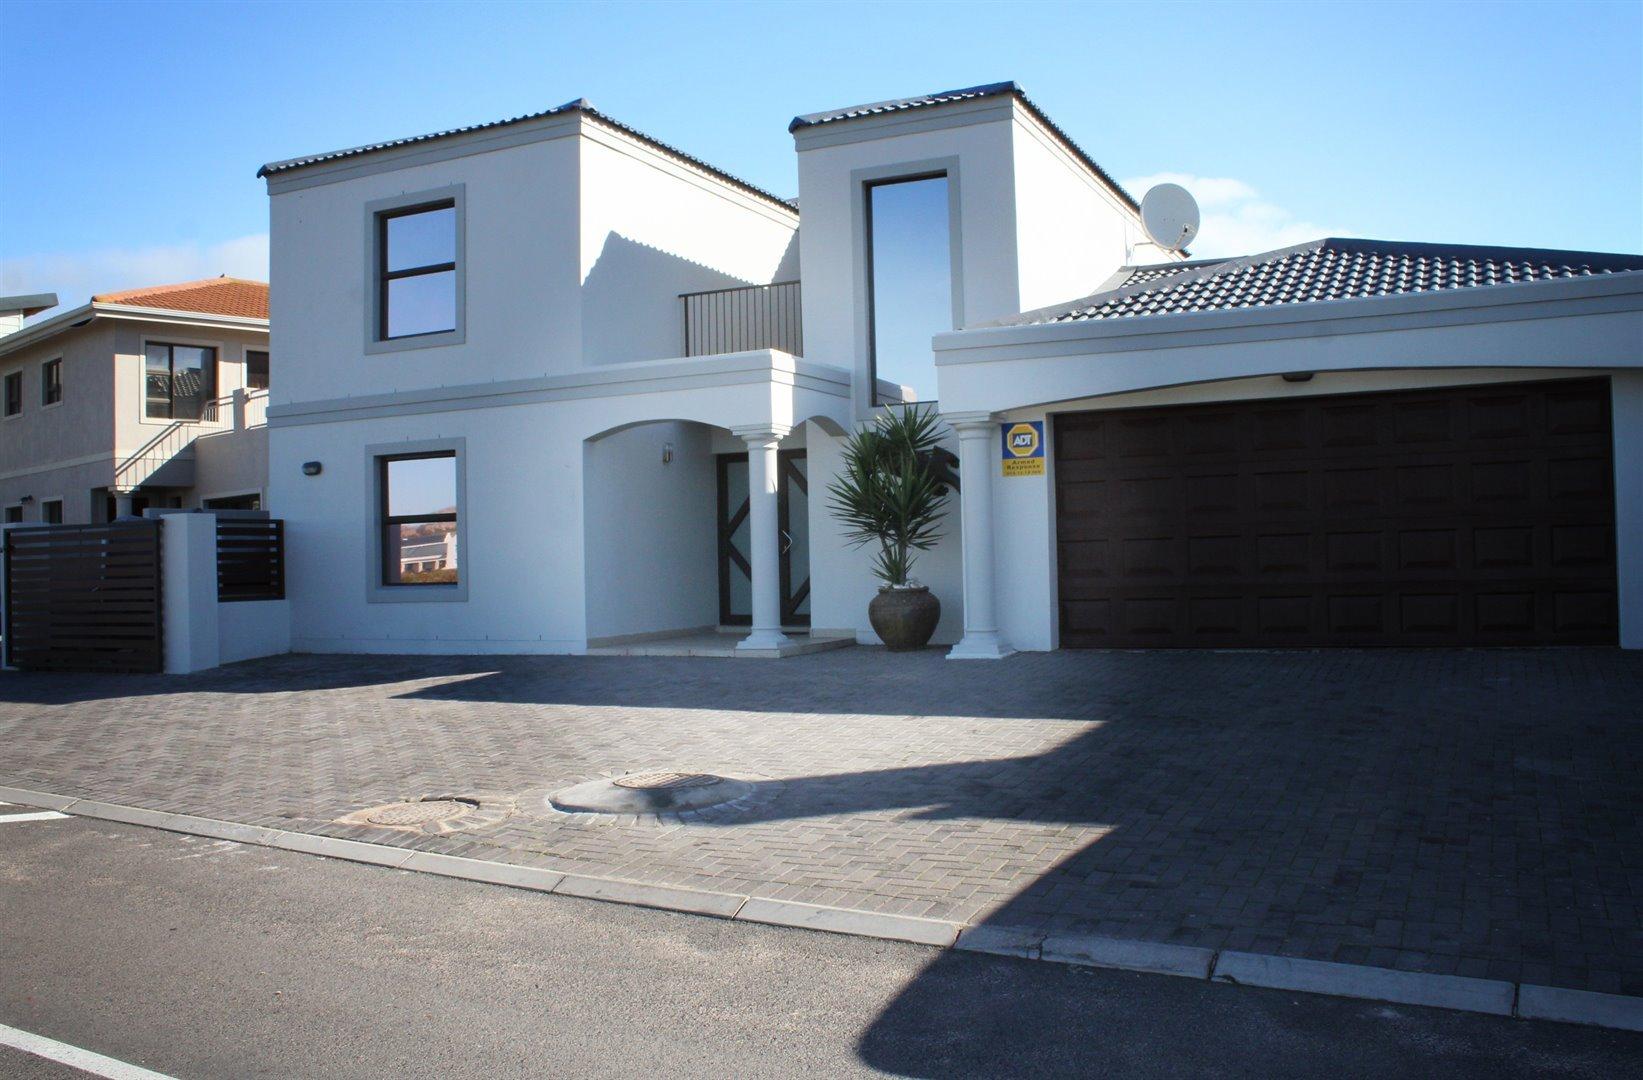 Langebaan, Langebaan Property  | Houses For Sale Langebaan, Langebaan, House 4 bedrooms property for sale Price:2,850,000